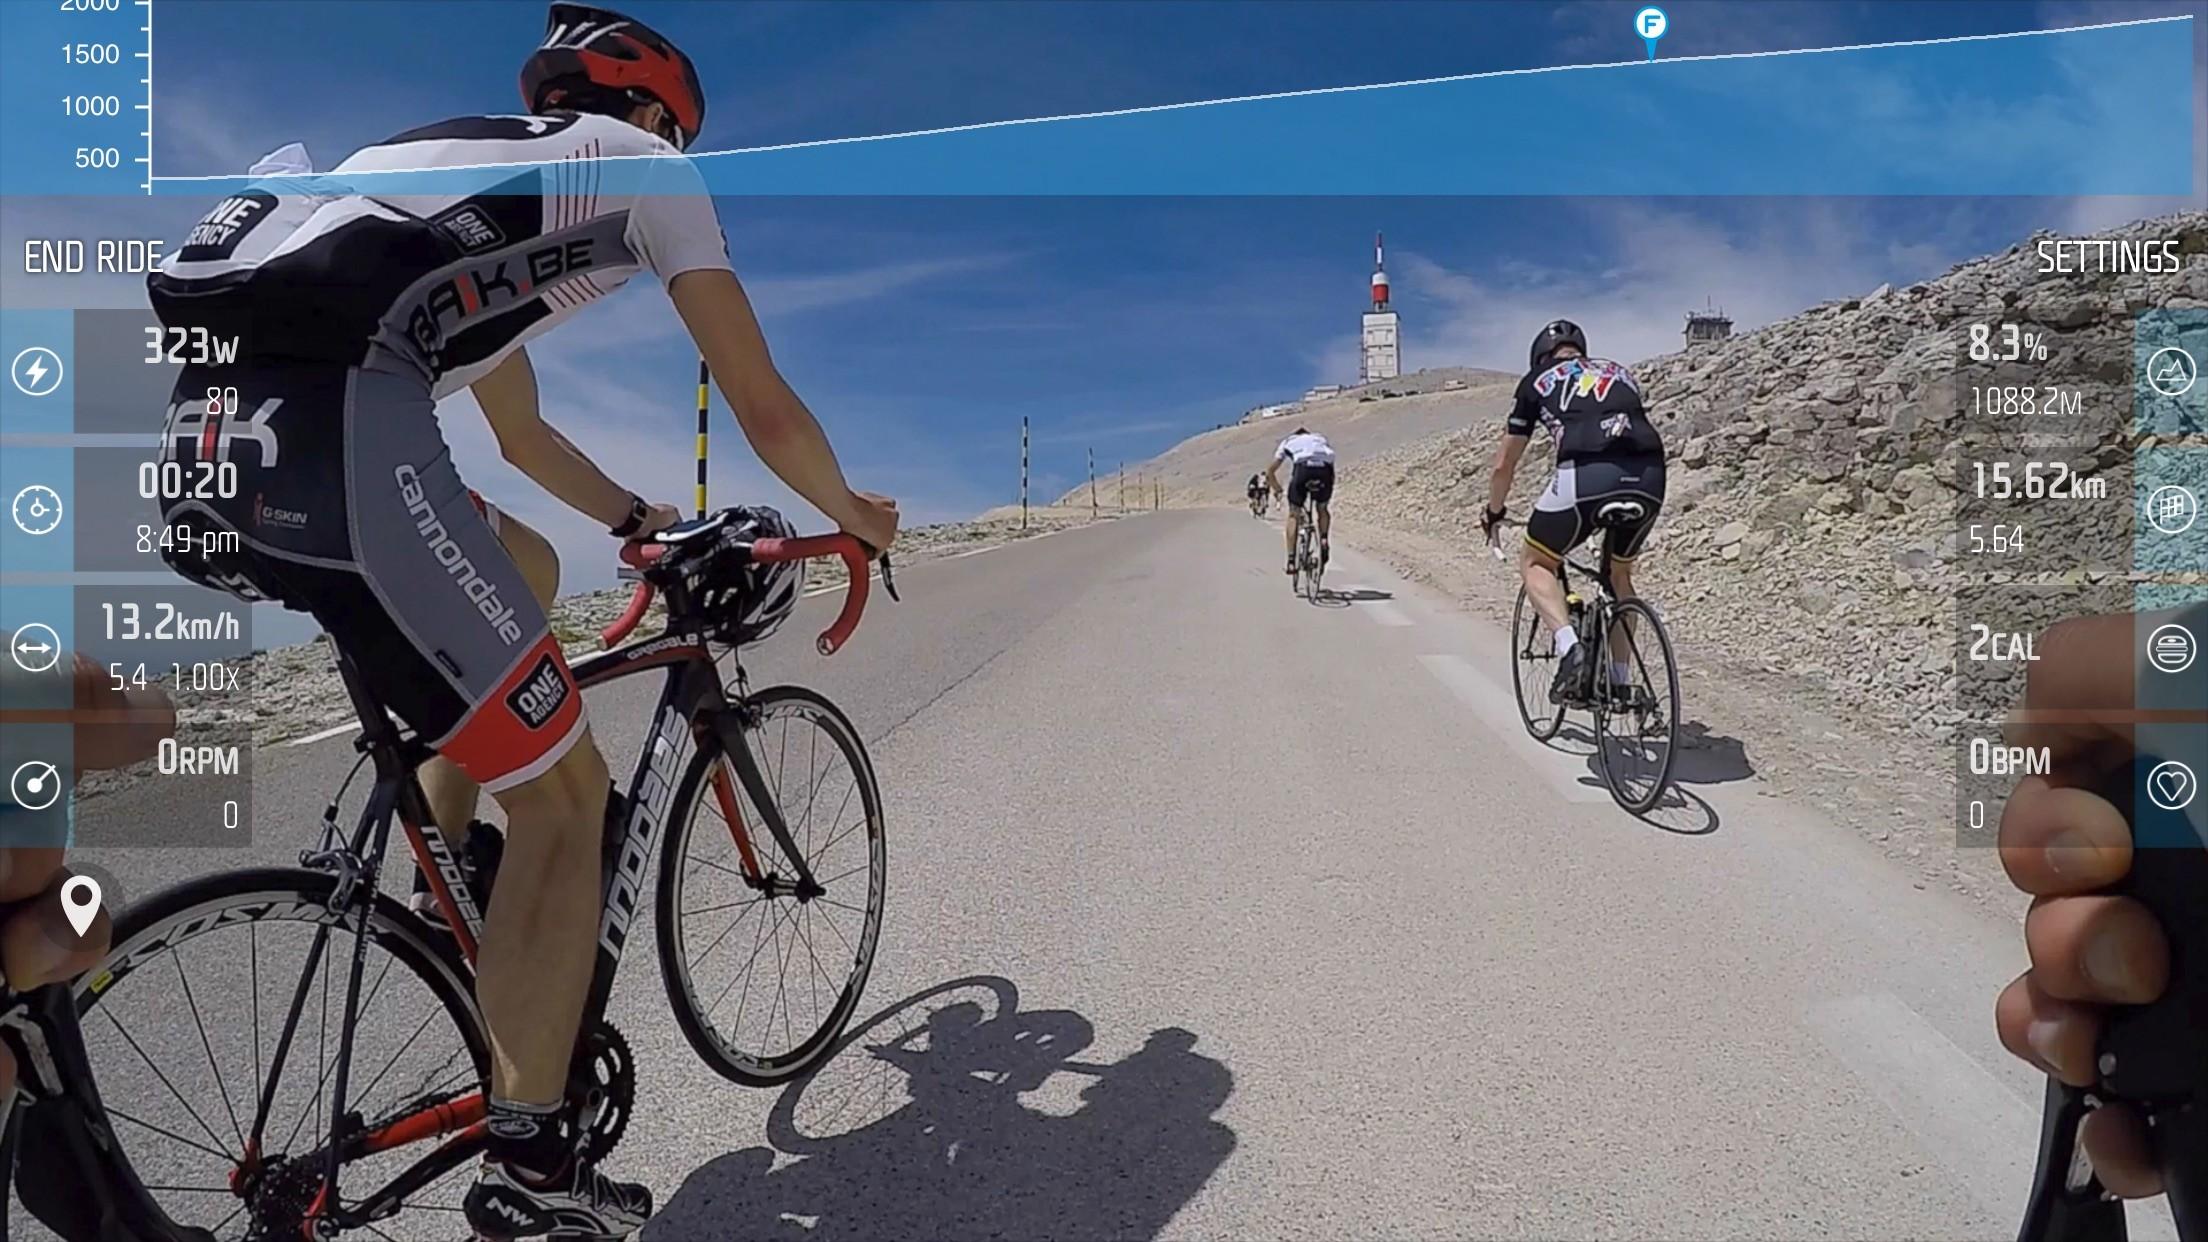 FulGaz uses POV video of iconic rides around the world